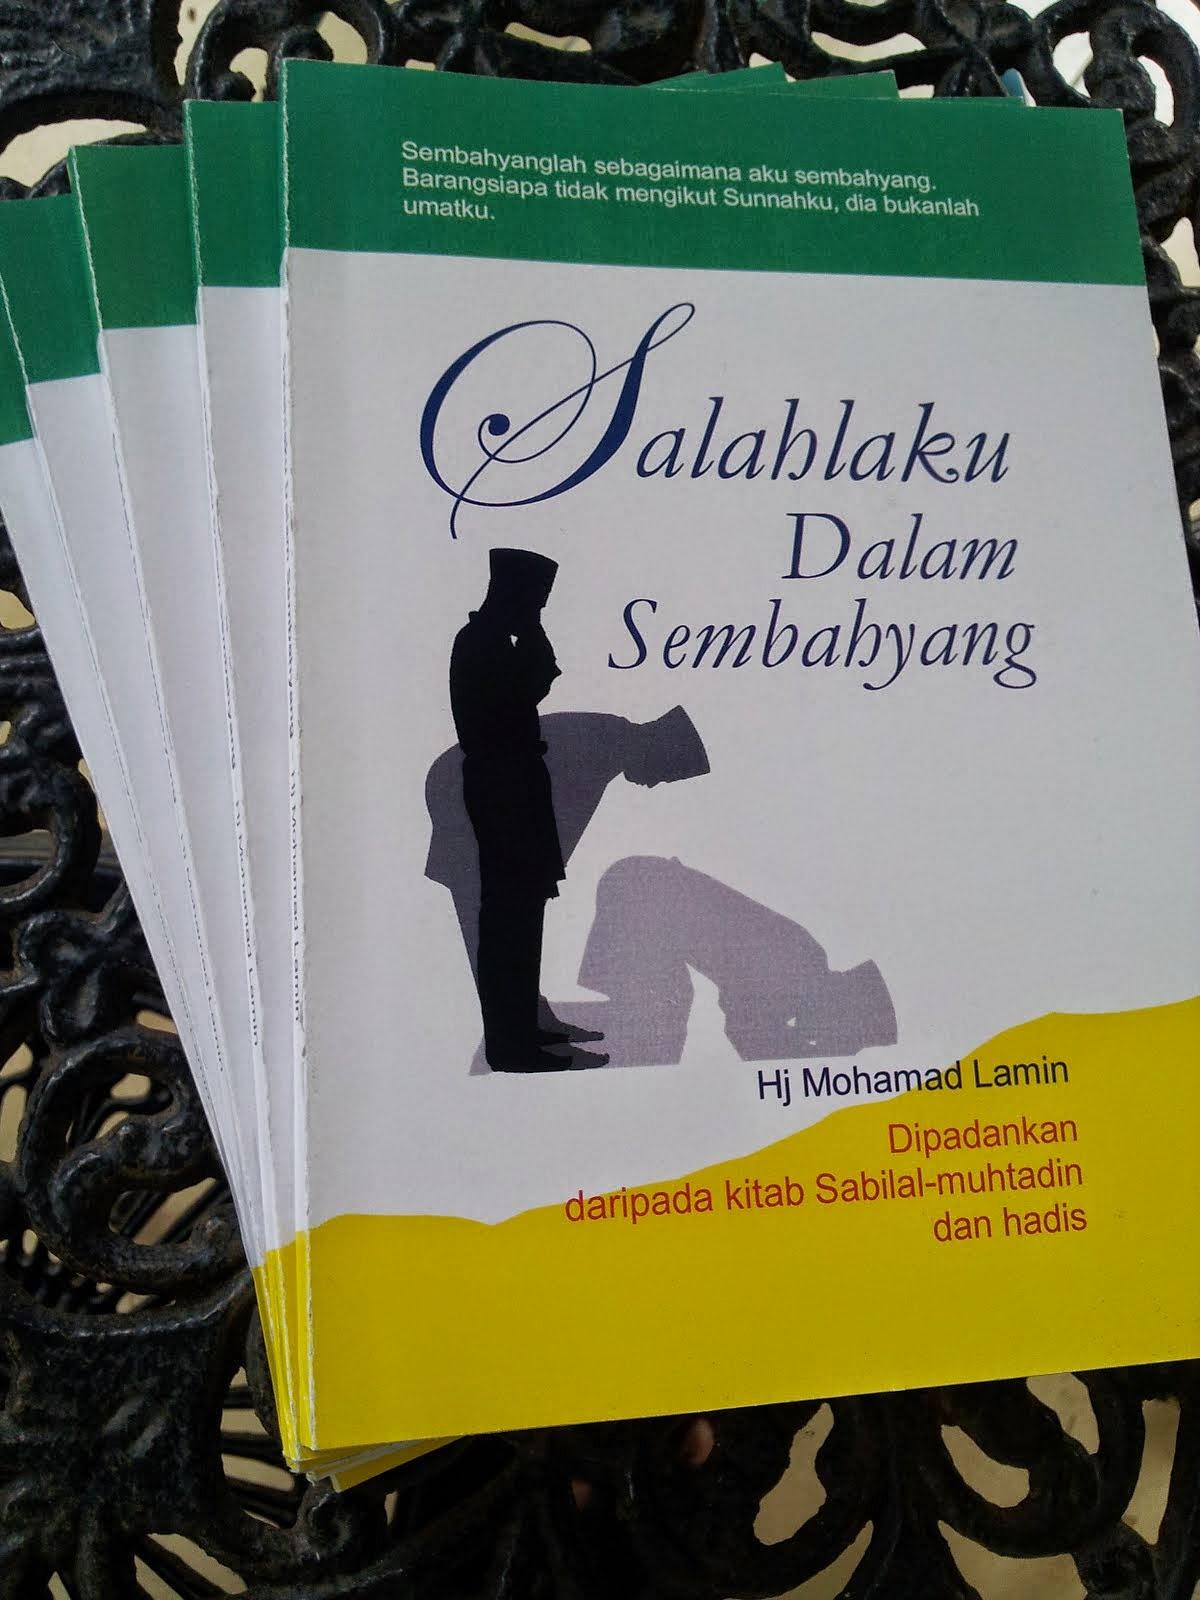 Buku Salahlaku Dalam Sembahyang